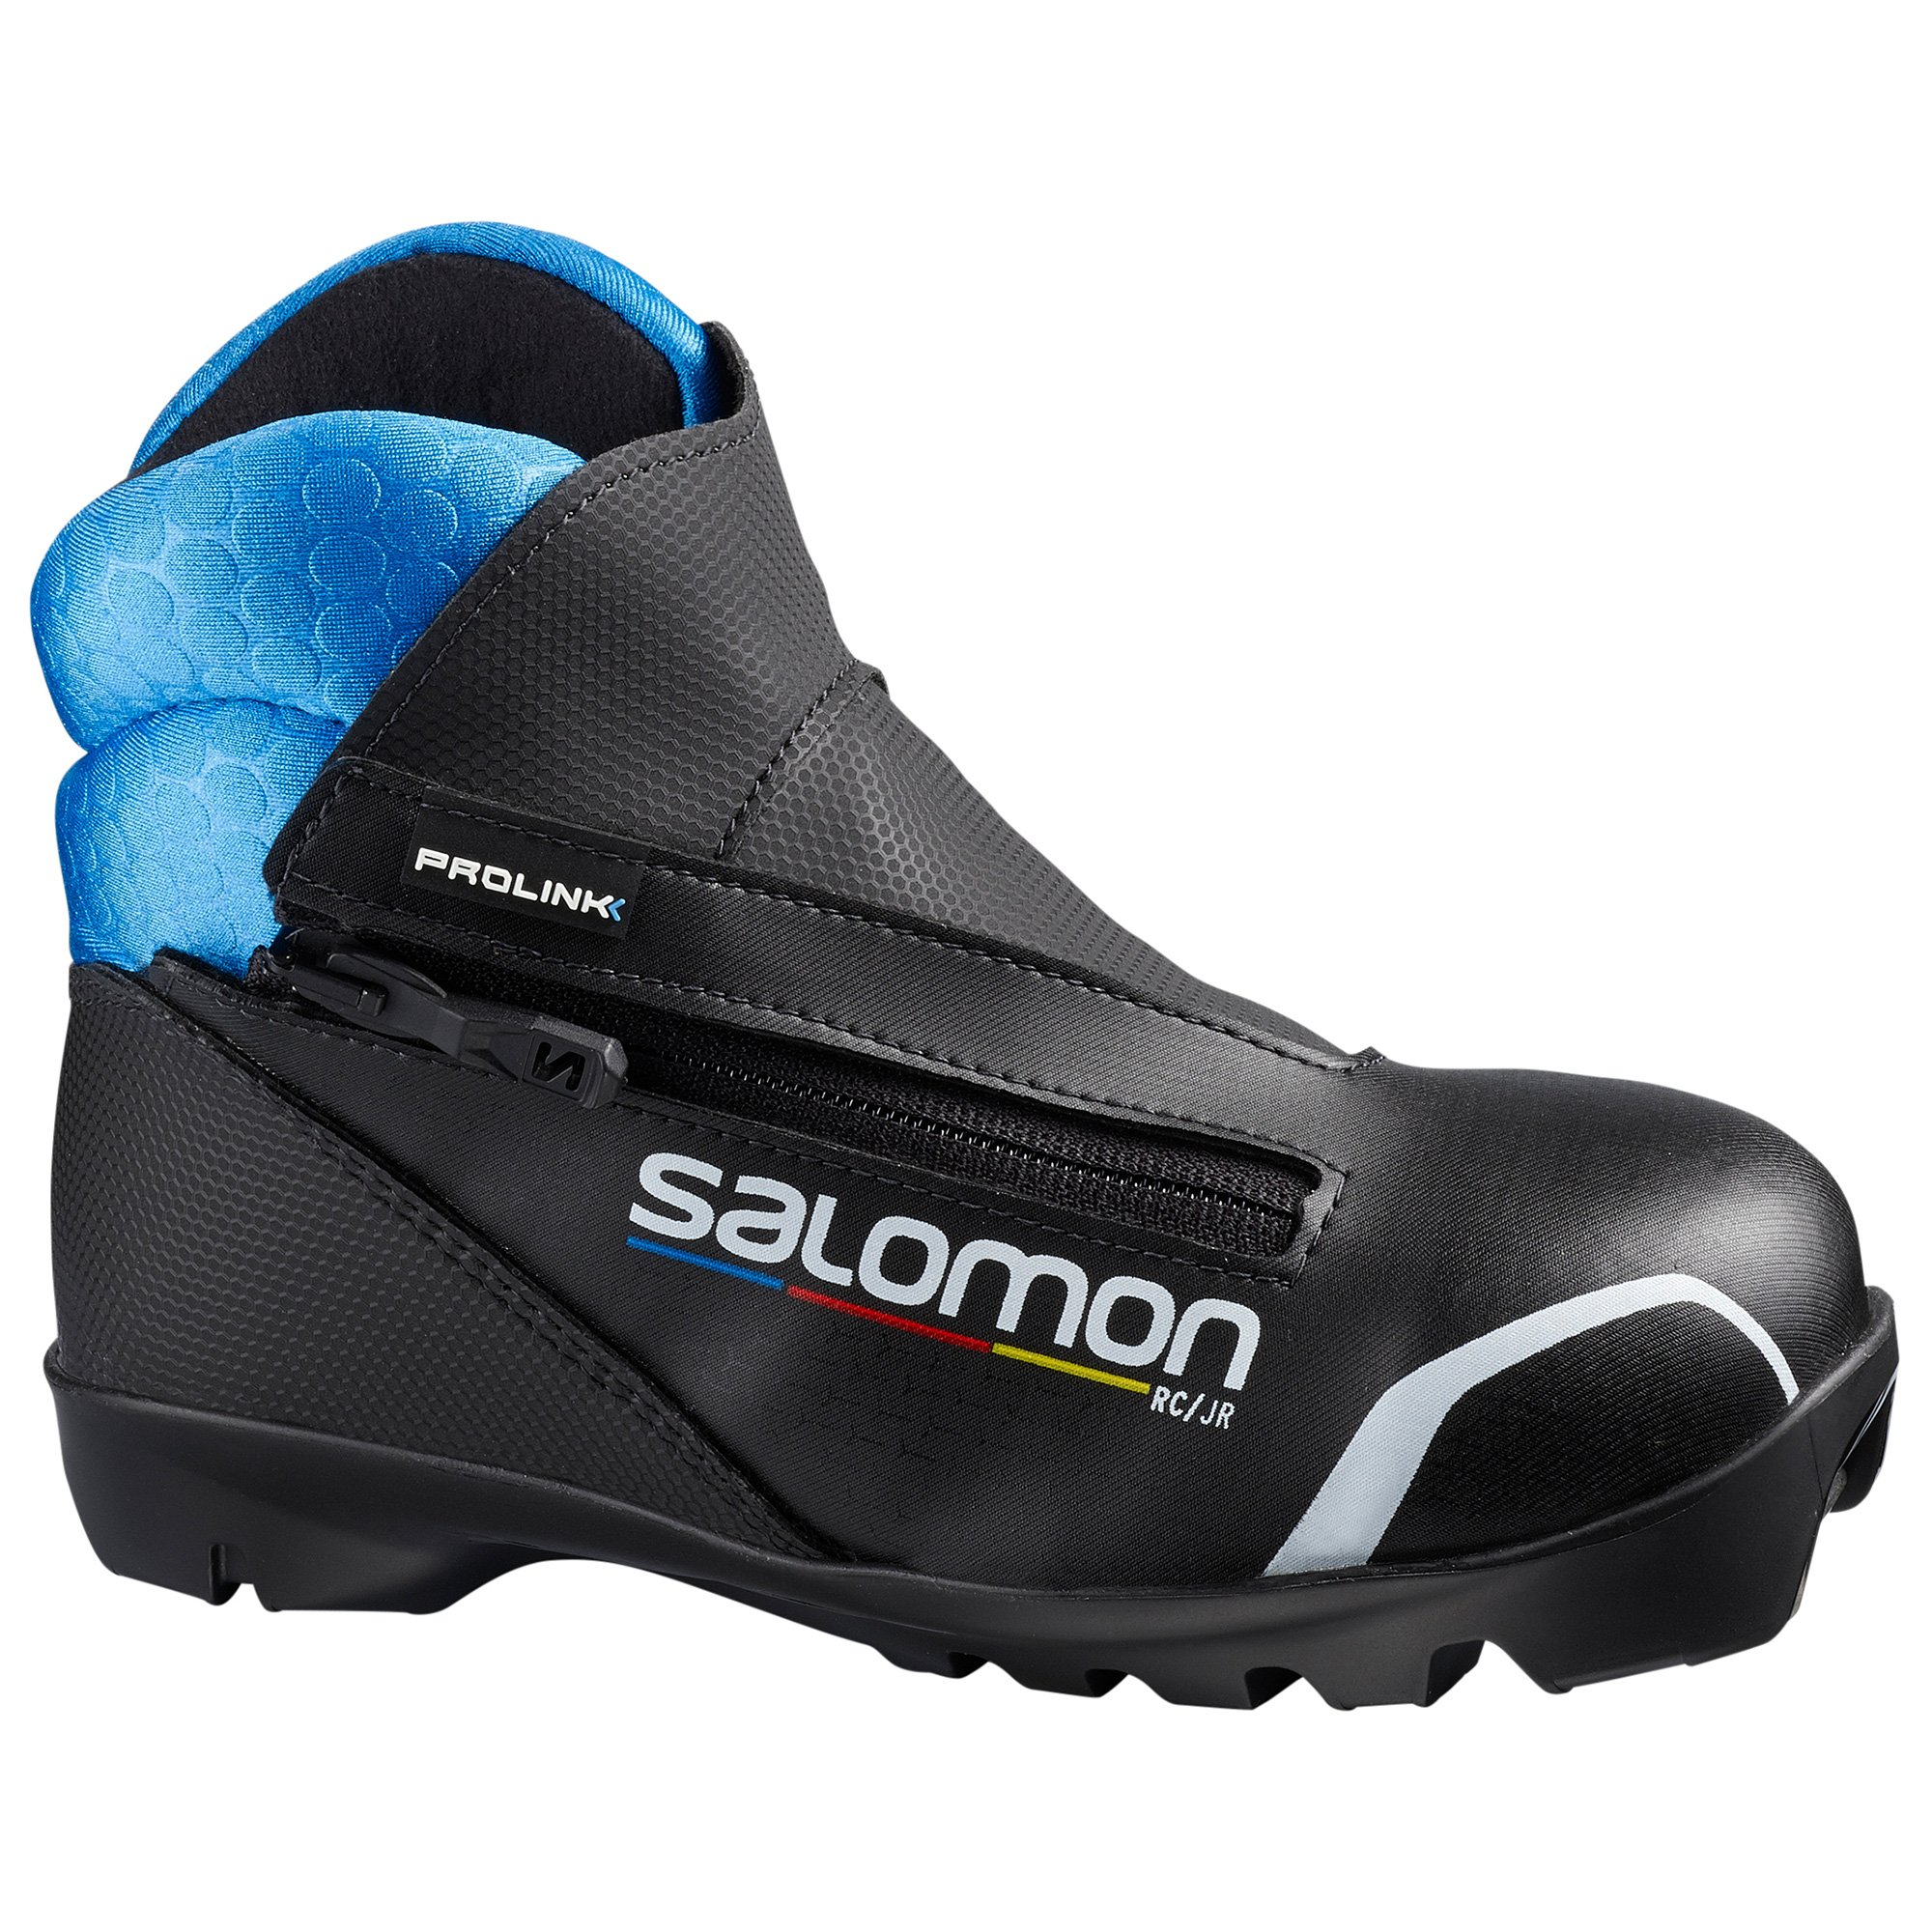 Salomon RC Prolink JR 2018/19